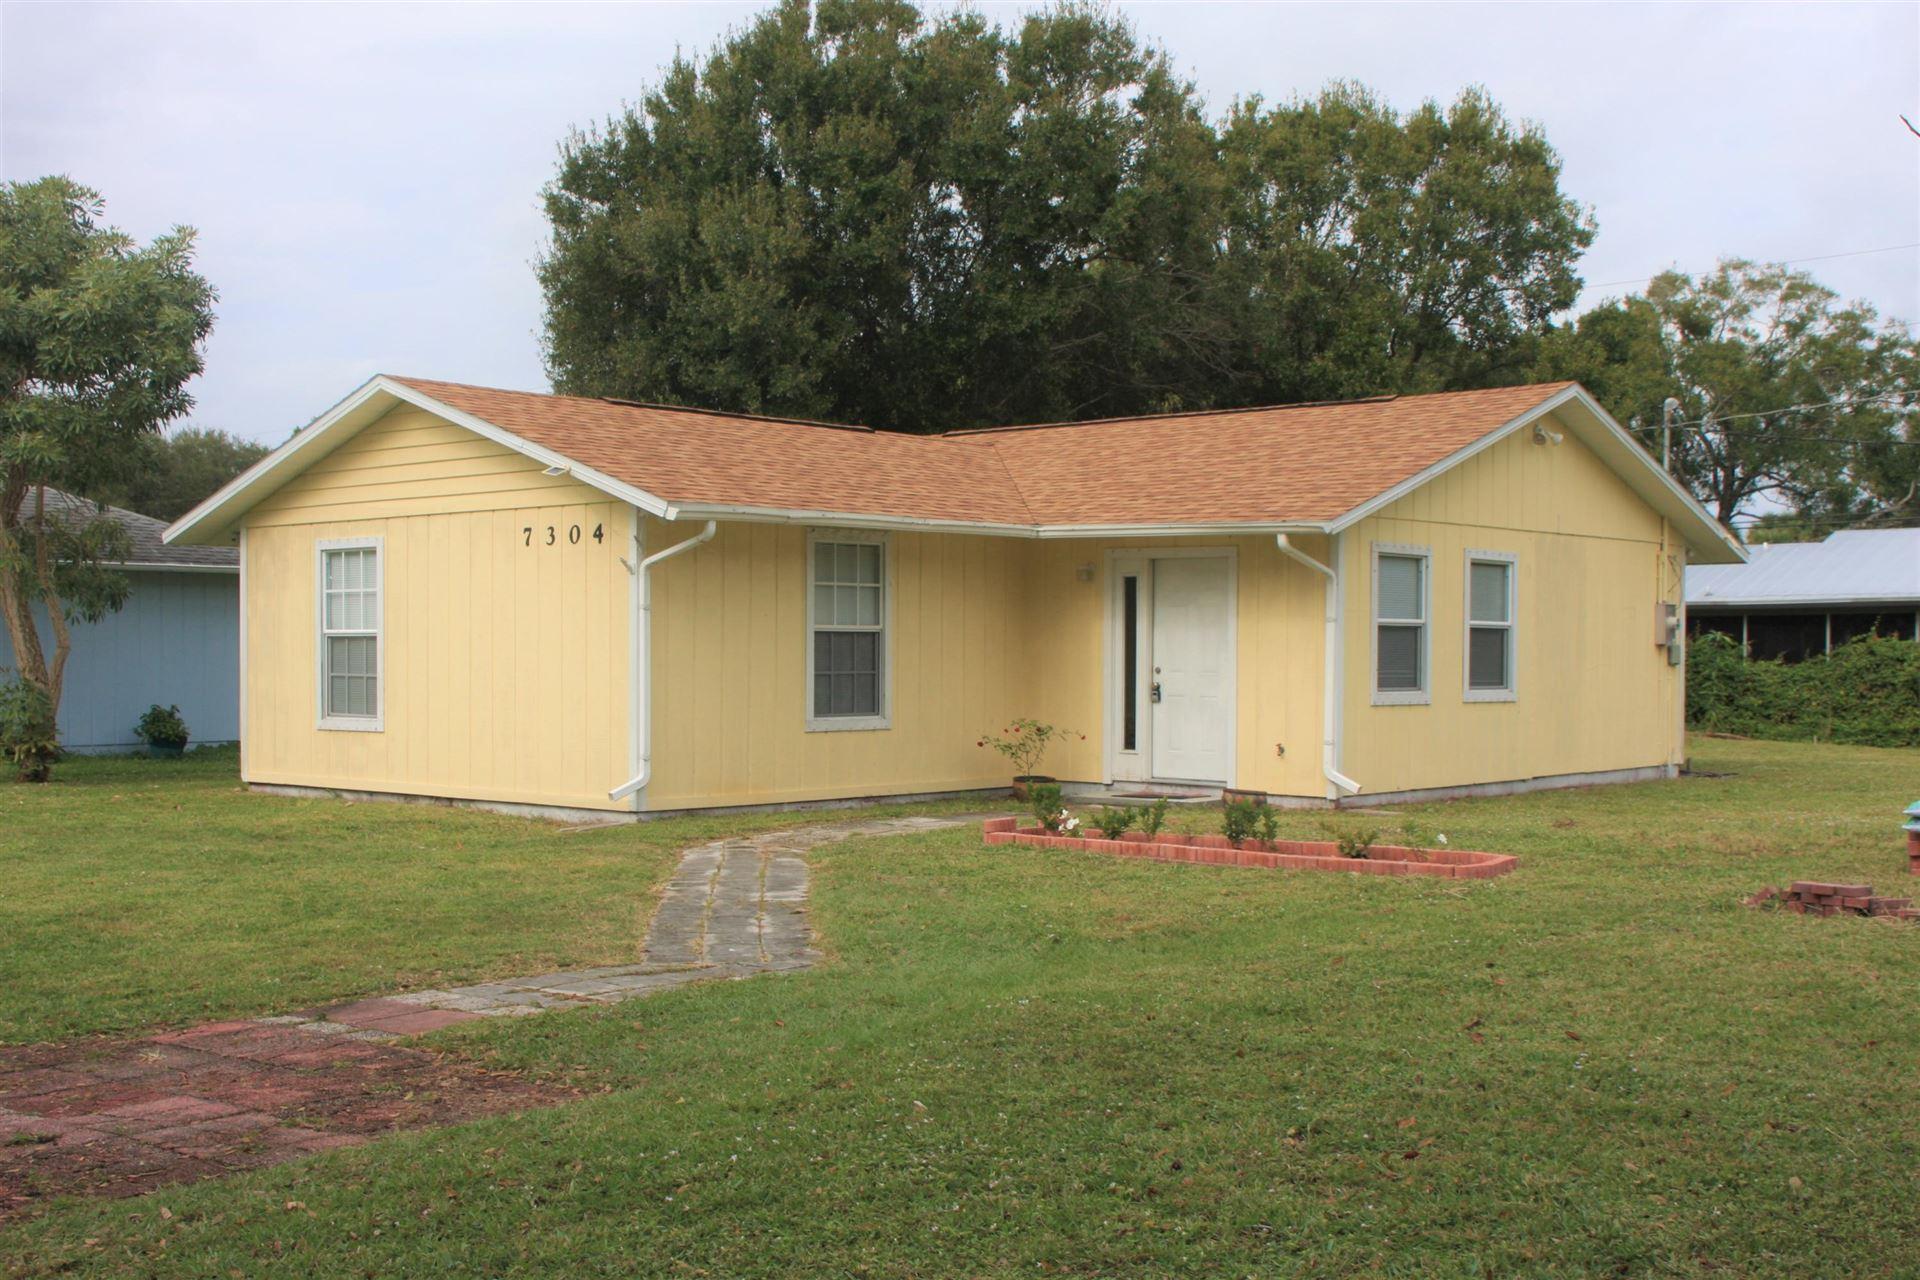 7304 Deland Avenue, Fort Pierce, FL 34951 - #: RX-10637937